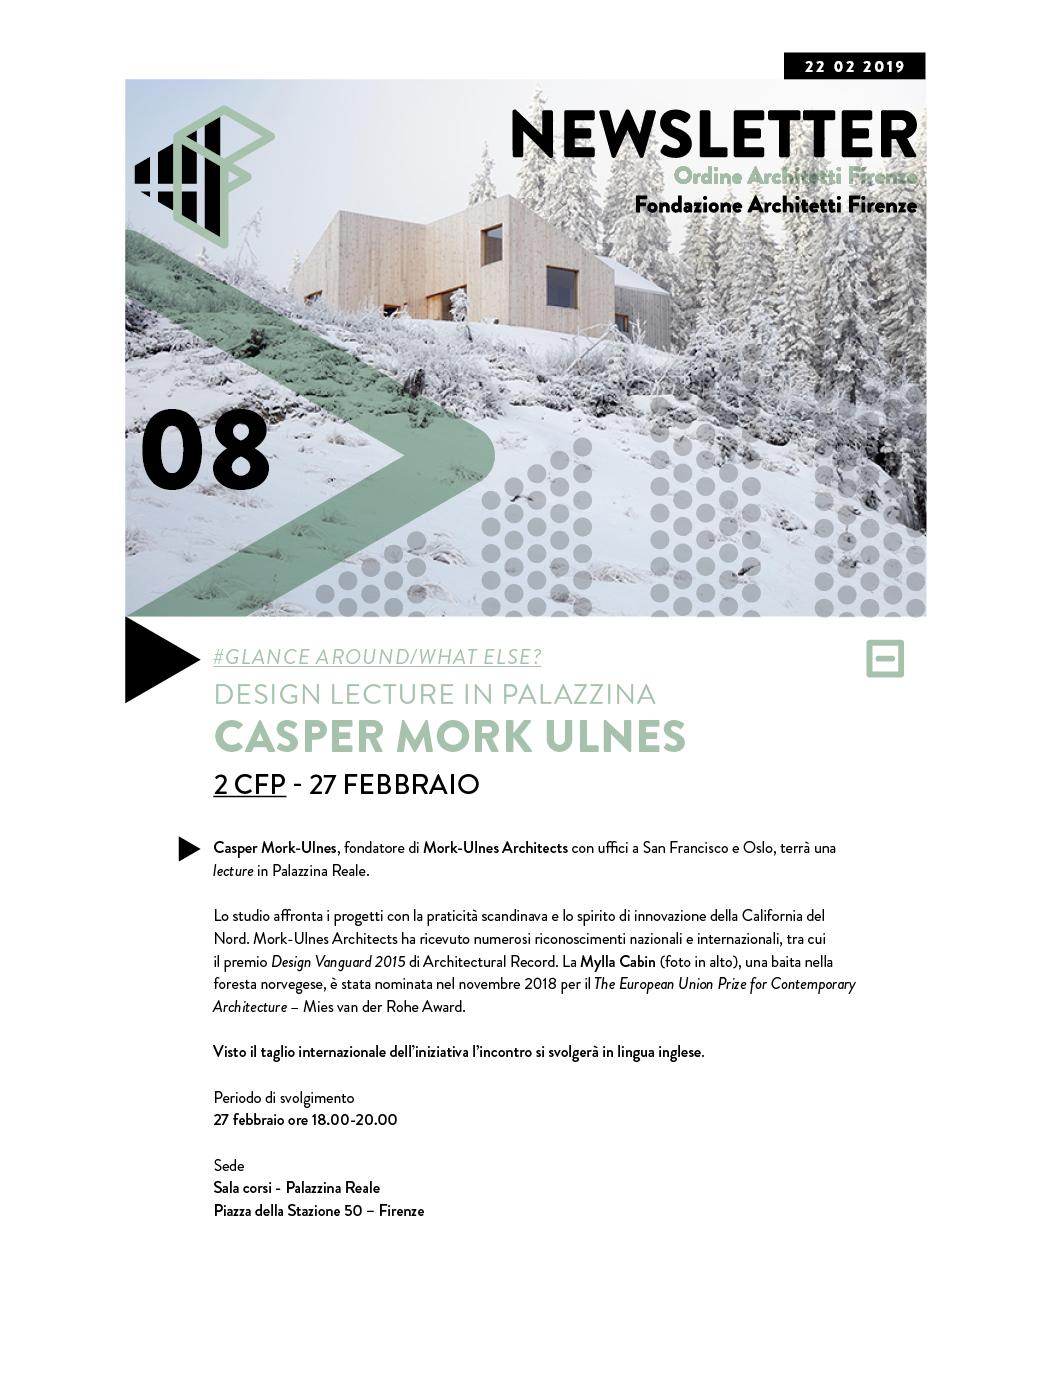 #Glance around/What else? DESIGN LECTURE in PALAZZINA CASPER MORK ULNES 2 CFP - 27 febbraio